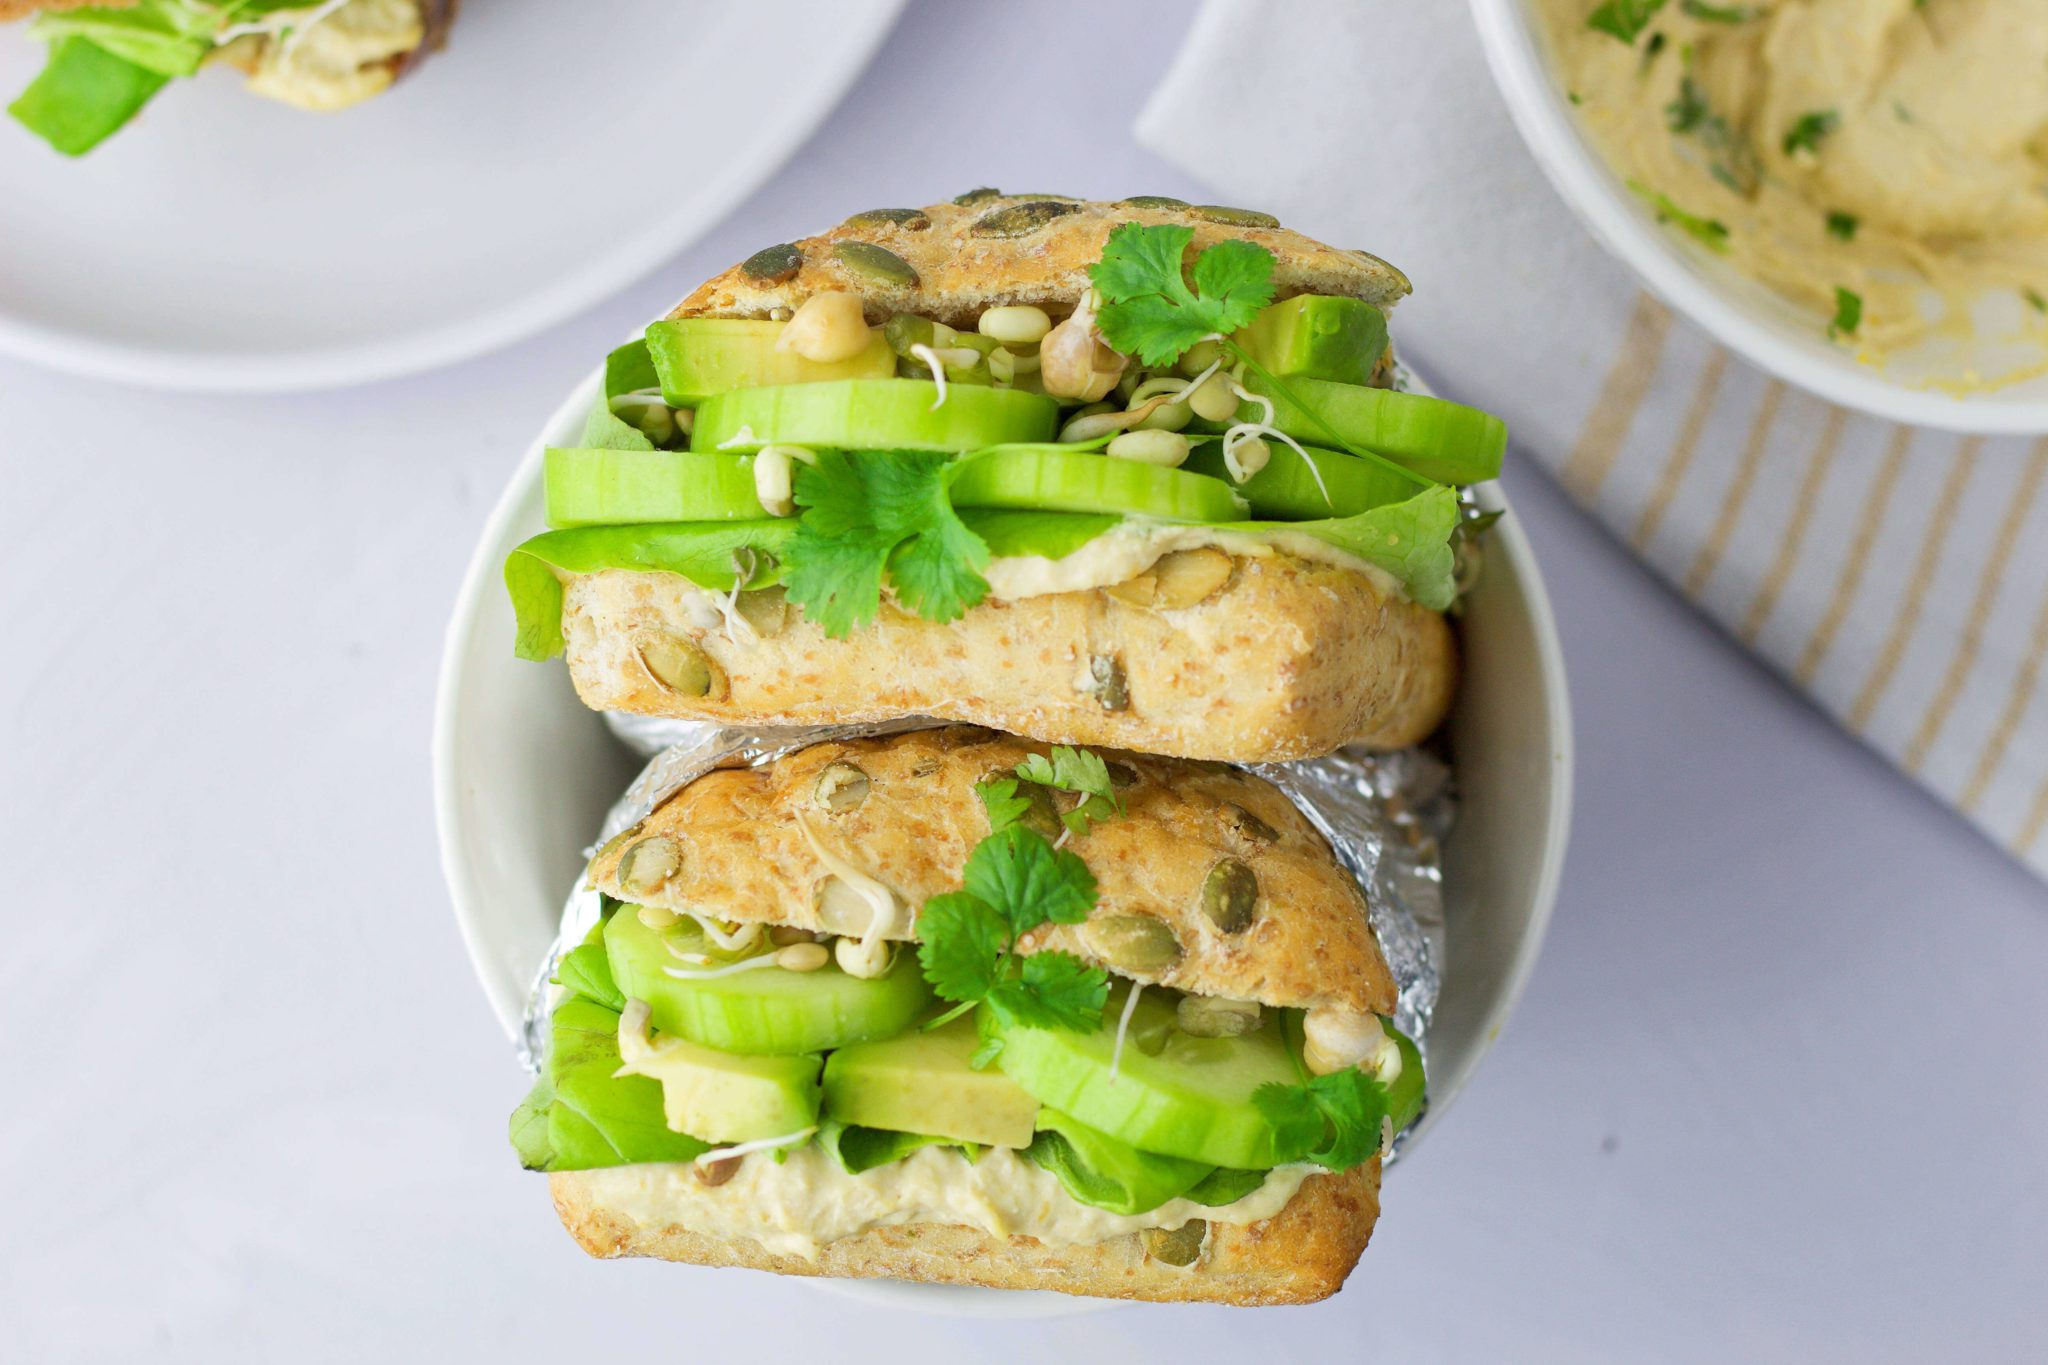 Easy green sandwich (VeGaN)